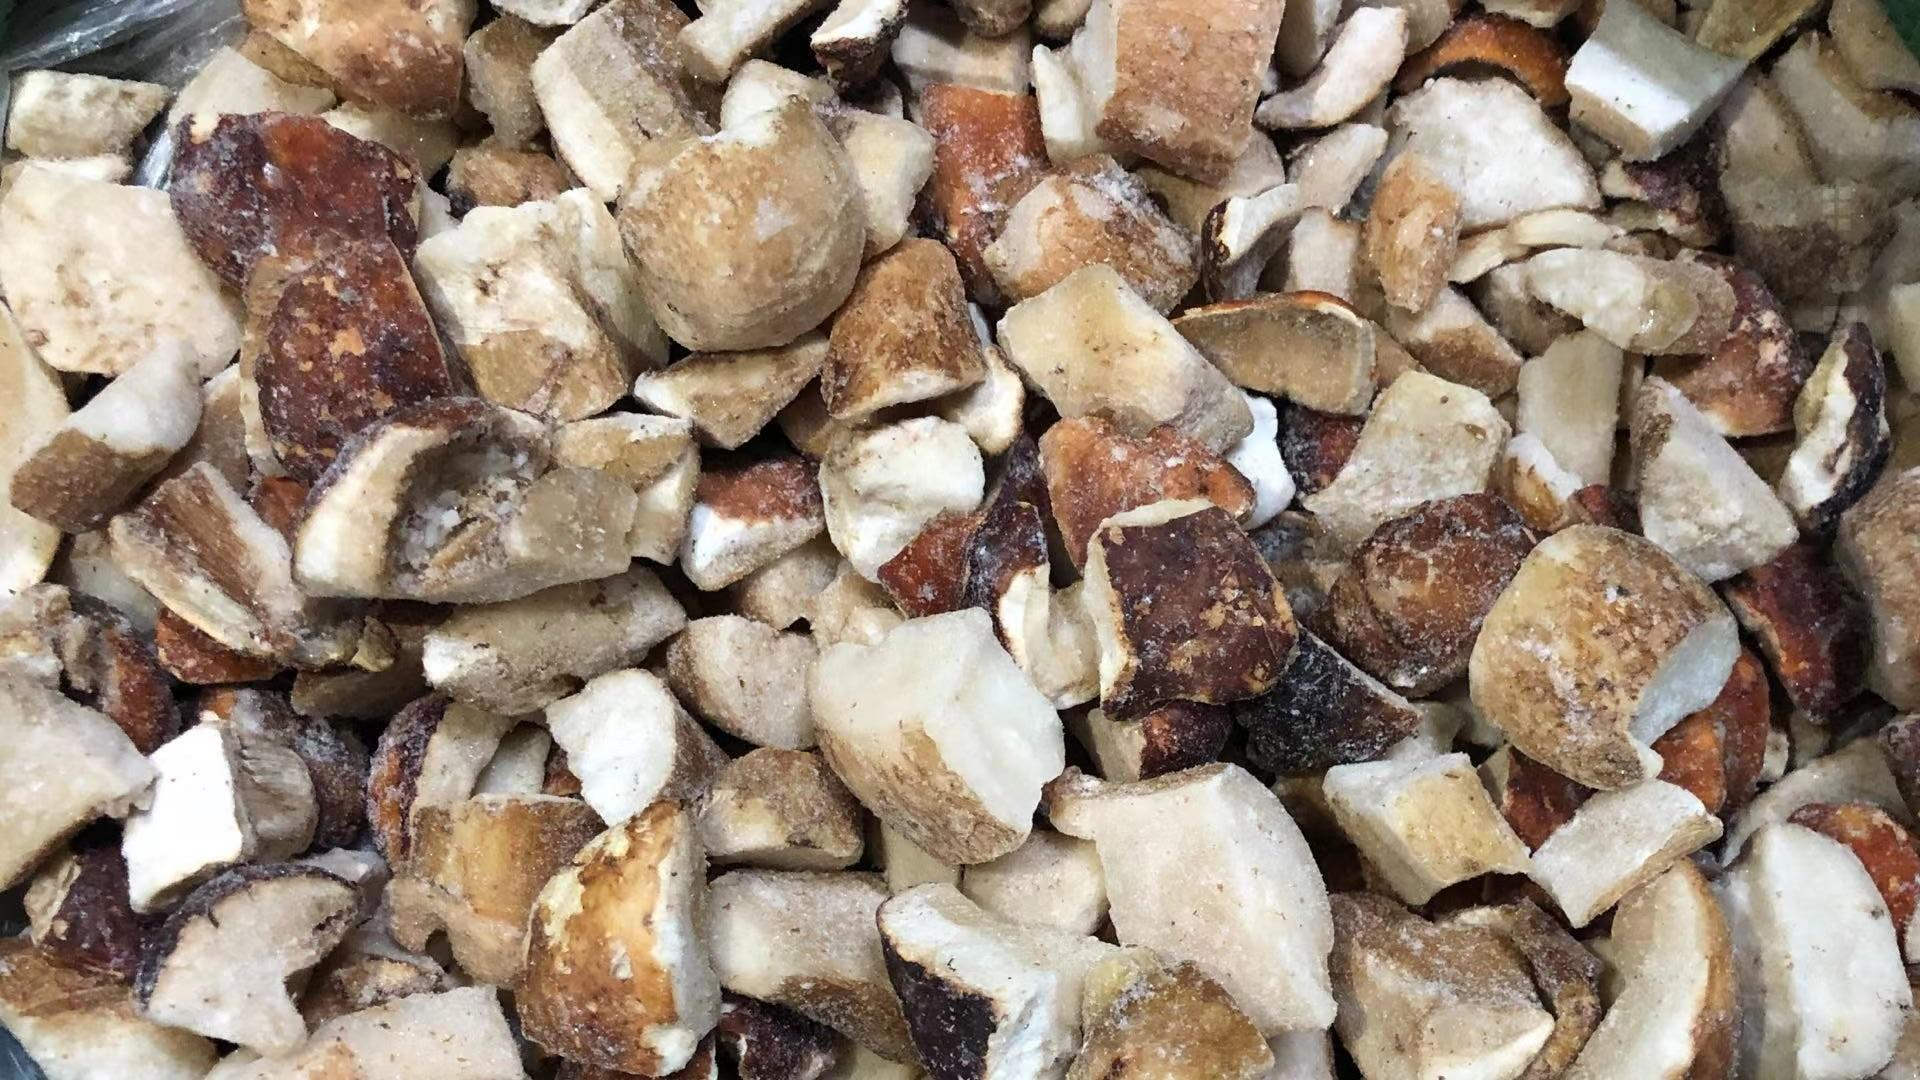 IQF Mixed Mushrooms,Frozen Mixed Mushrooms,Mushrooms Blend,Wild Mushrooms Blend 19